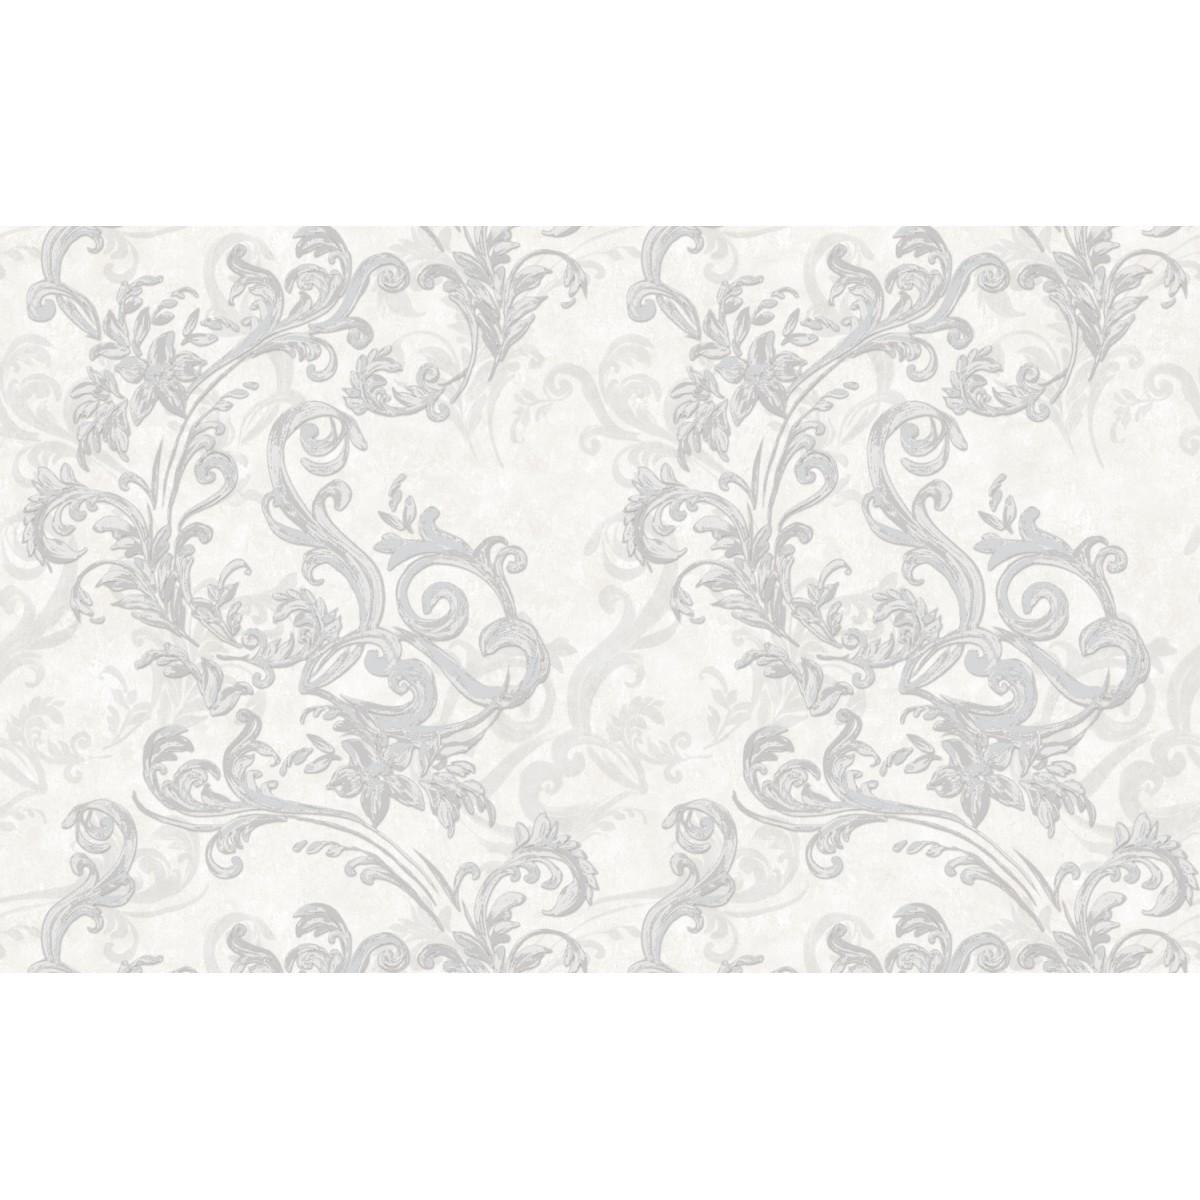 Обои виниловые Shinhan Wallcoverings белые 1.06 м 88364-1